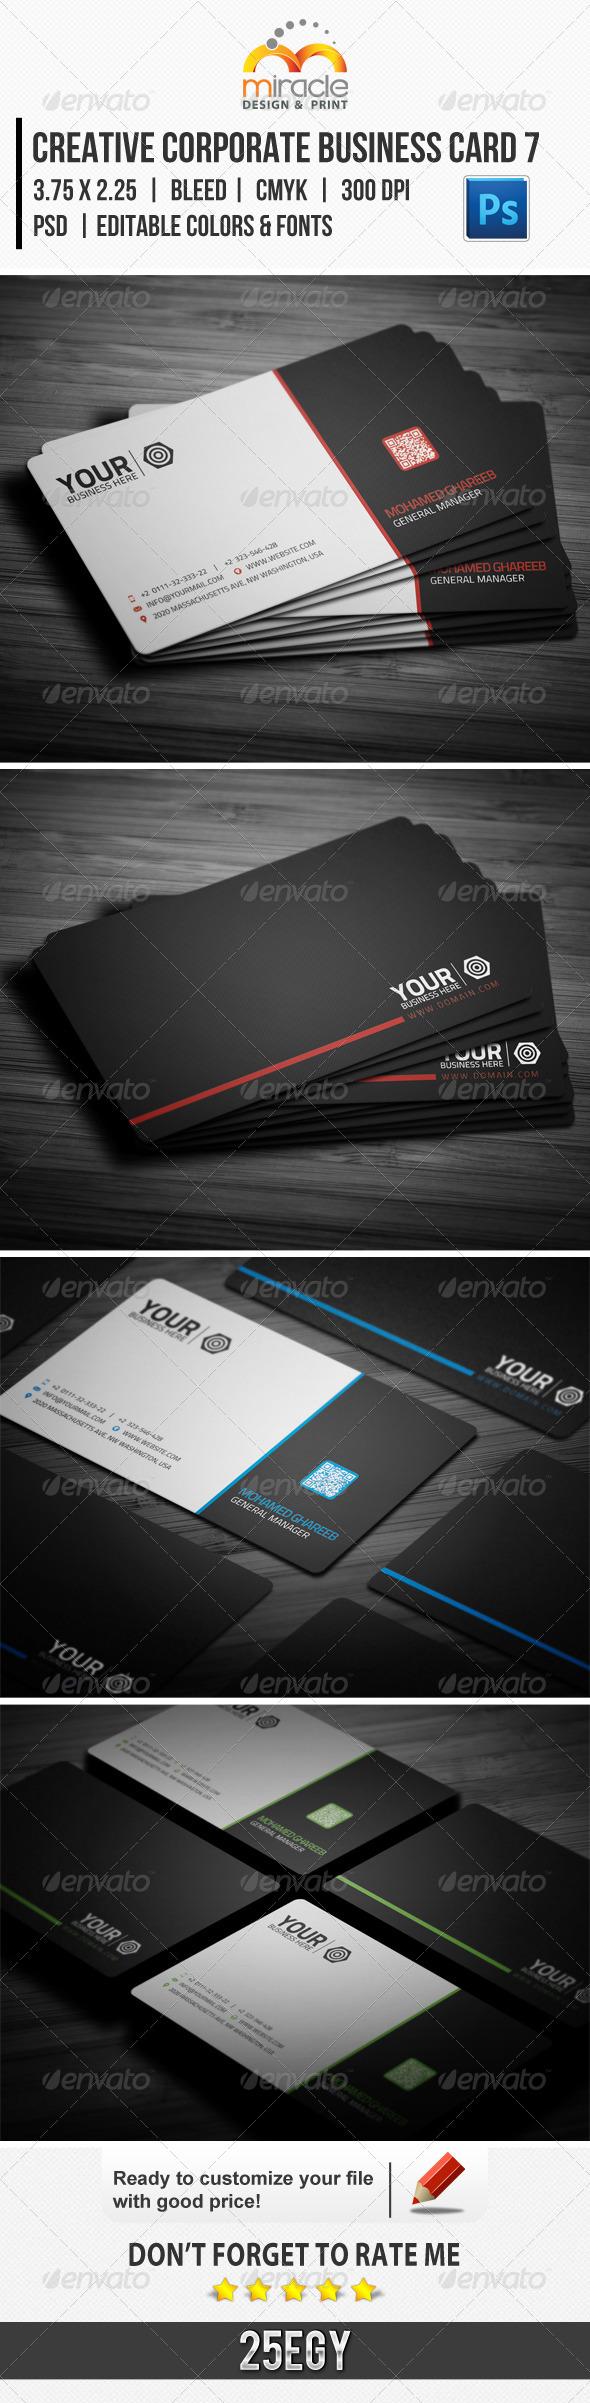 Creative Corporate Business Card 7 - Corporate Business Cards